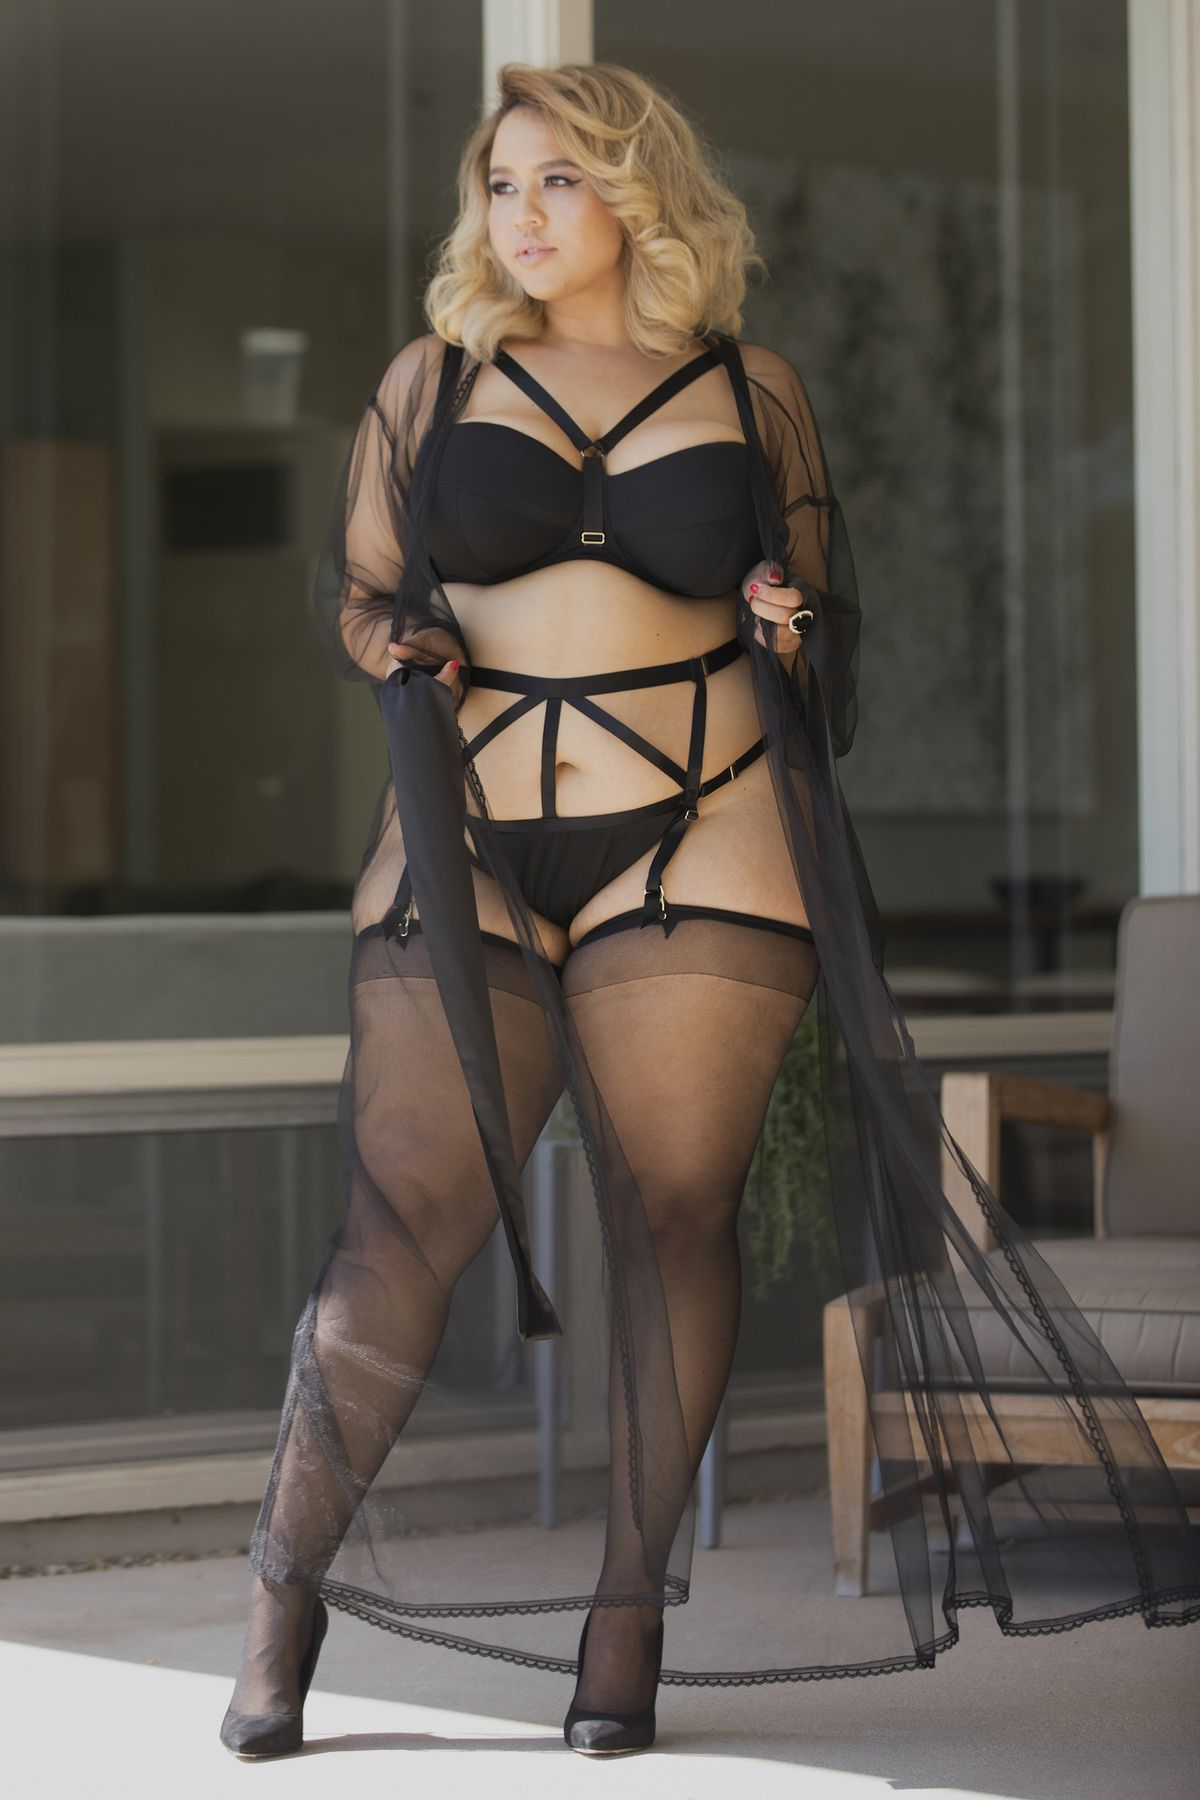 Model Gabi Fresh in black lingerie and a robe